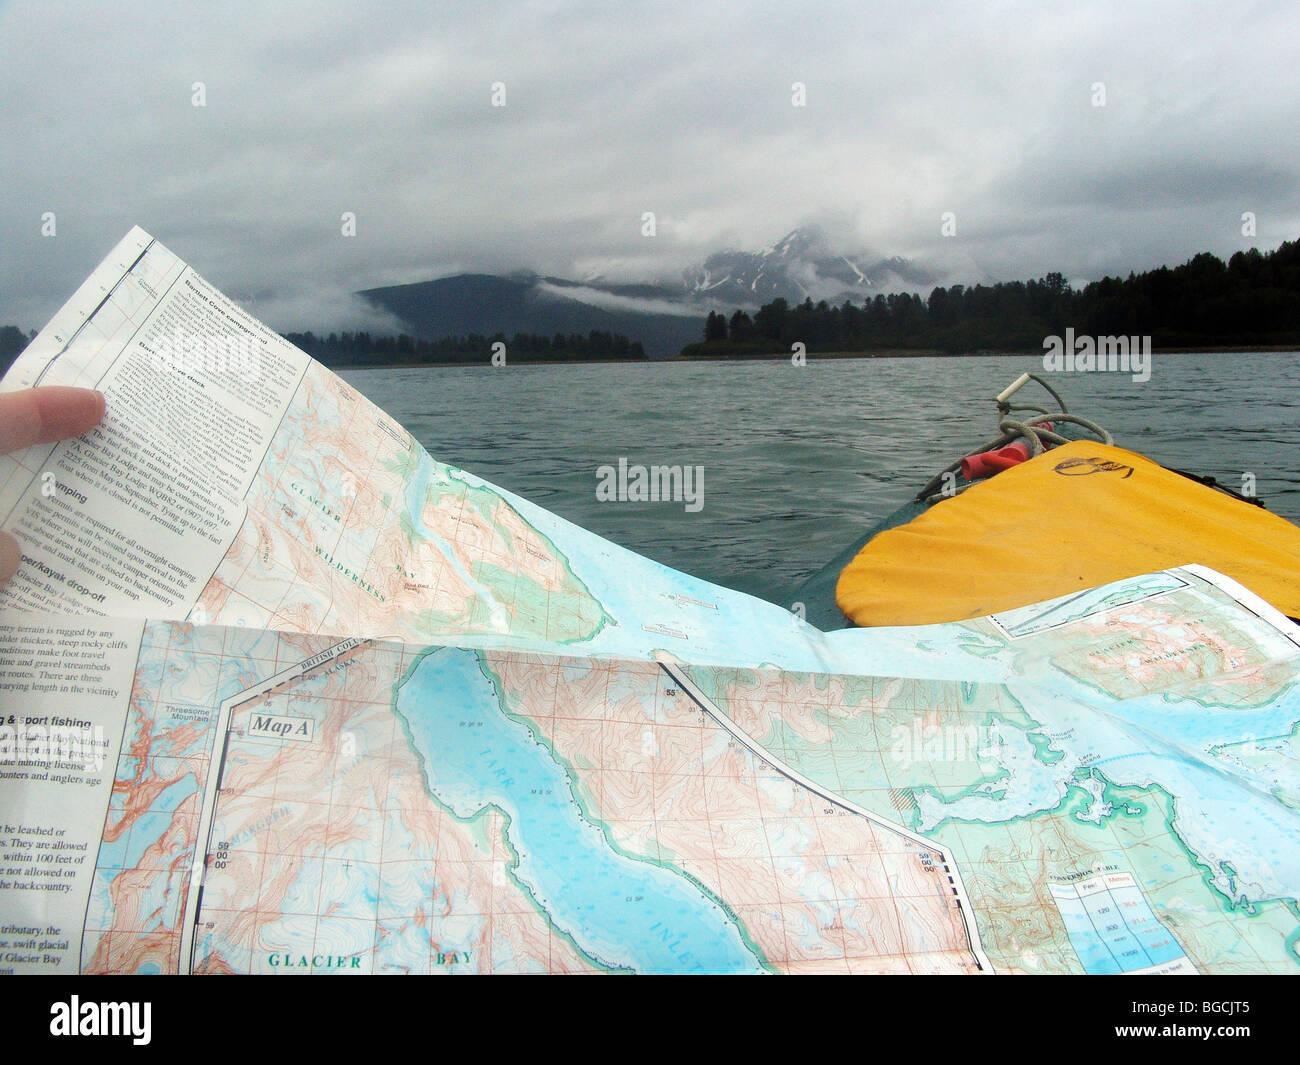 Kayak tour in the Glacier Bay National Park, Alaska, USA. - Stock Image